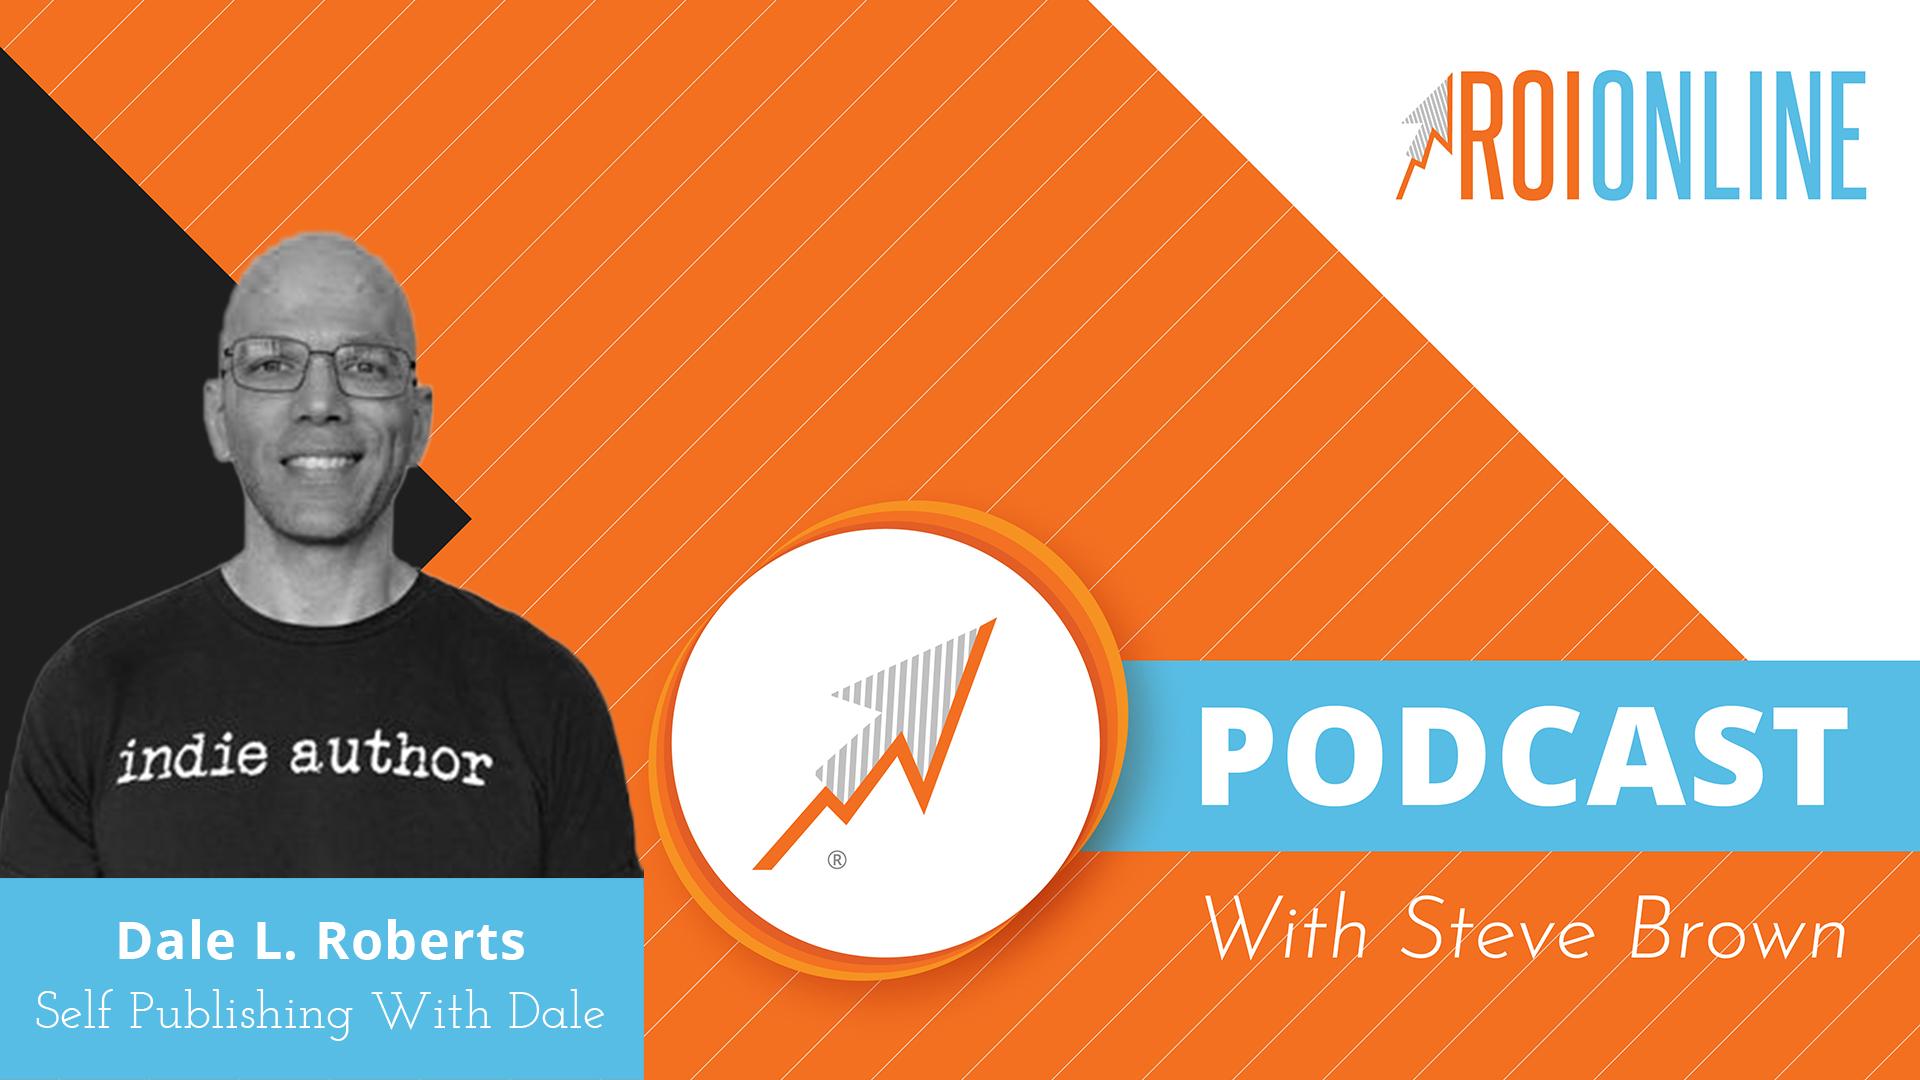 Dale L. Roberts podcast thumbnail